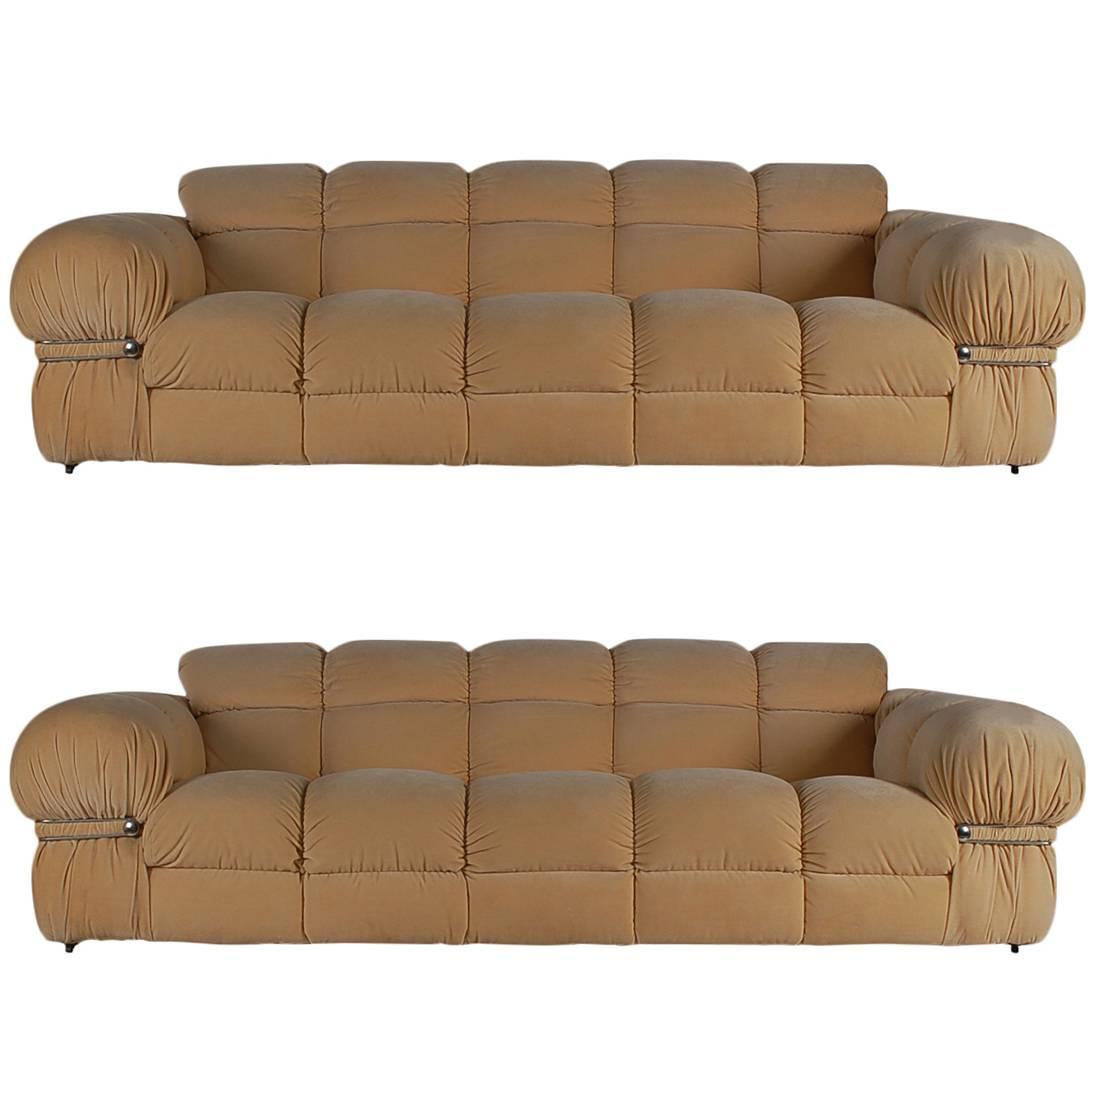 Pair Of Matching Mid-Century Italian Modern Sofas After Mario Bellini At  1stdibs